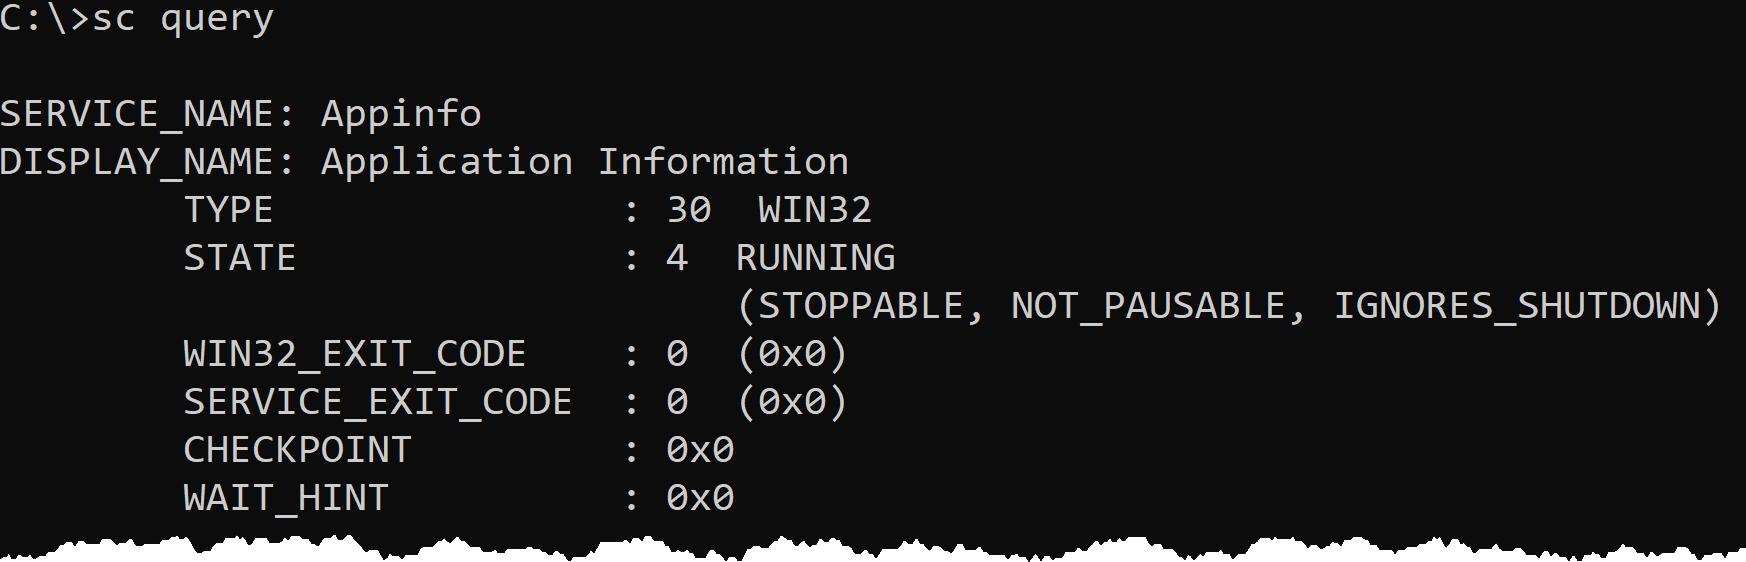 Run the sc query command